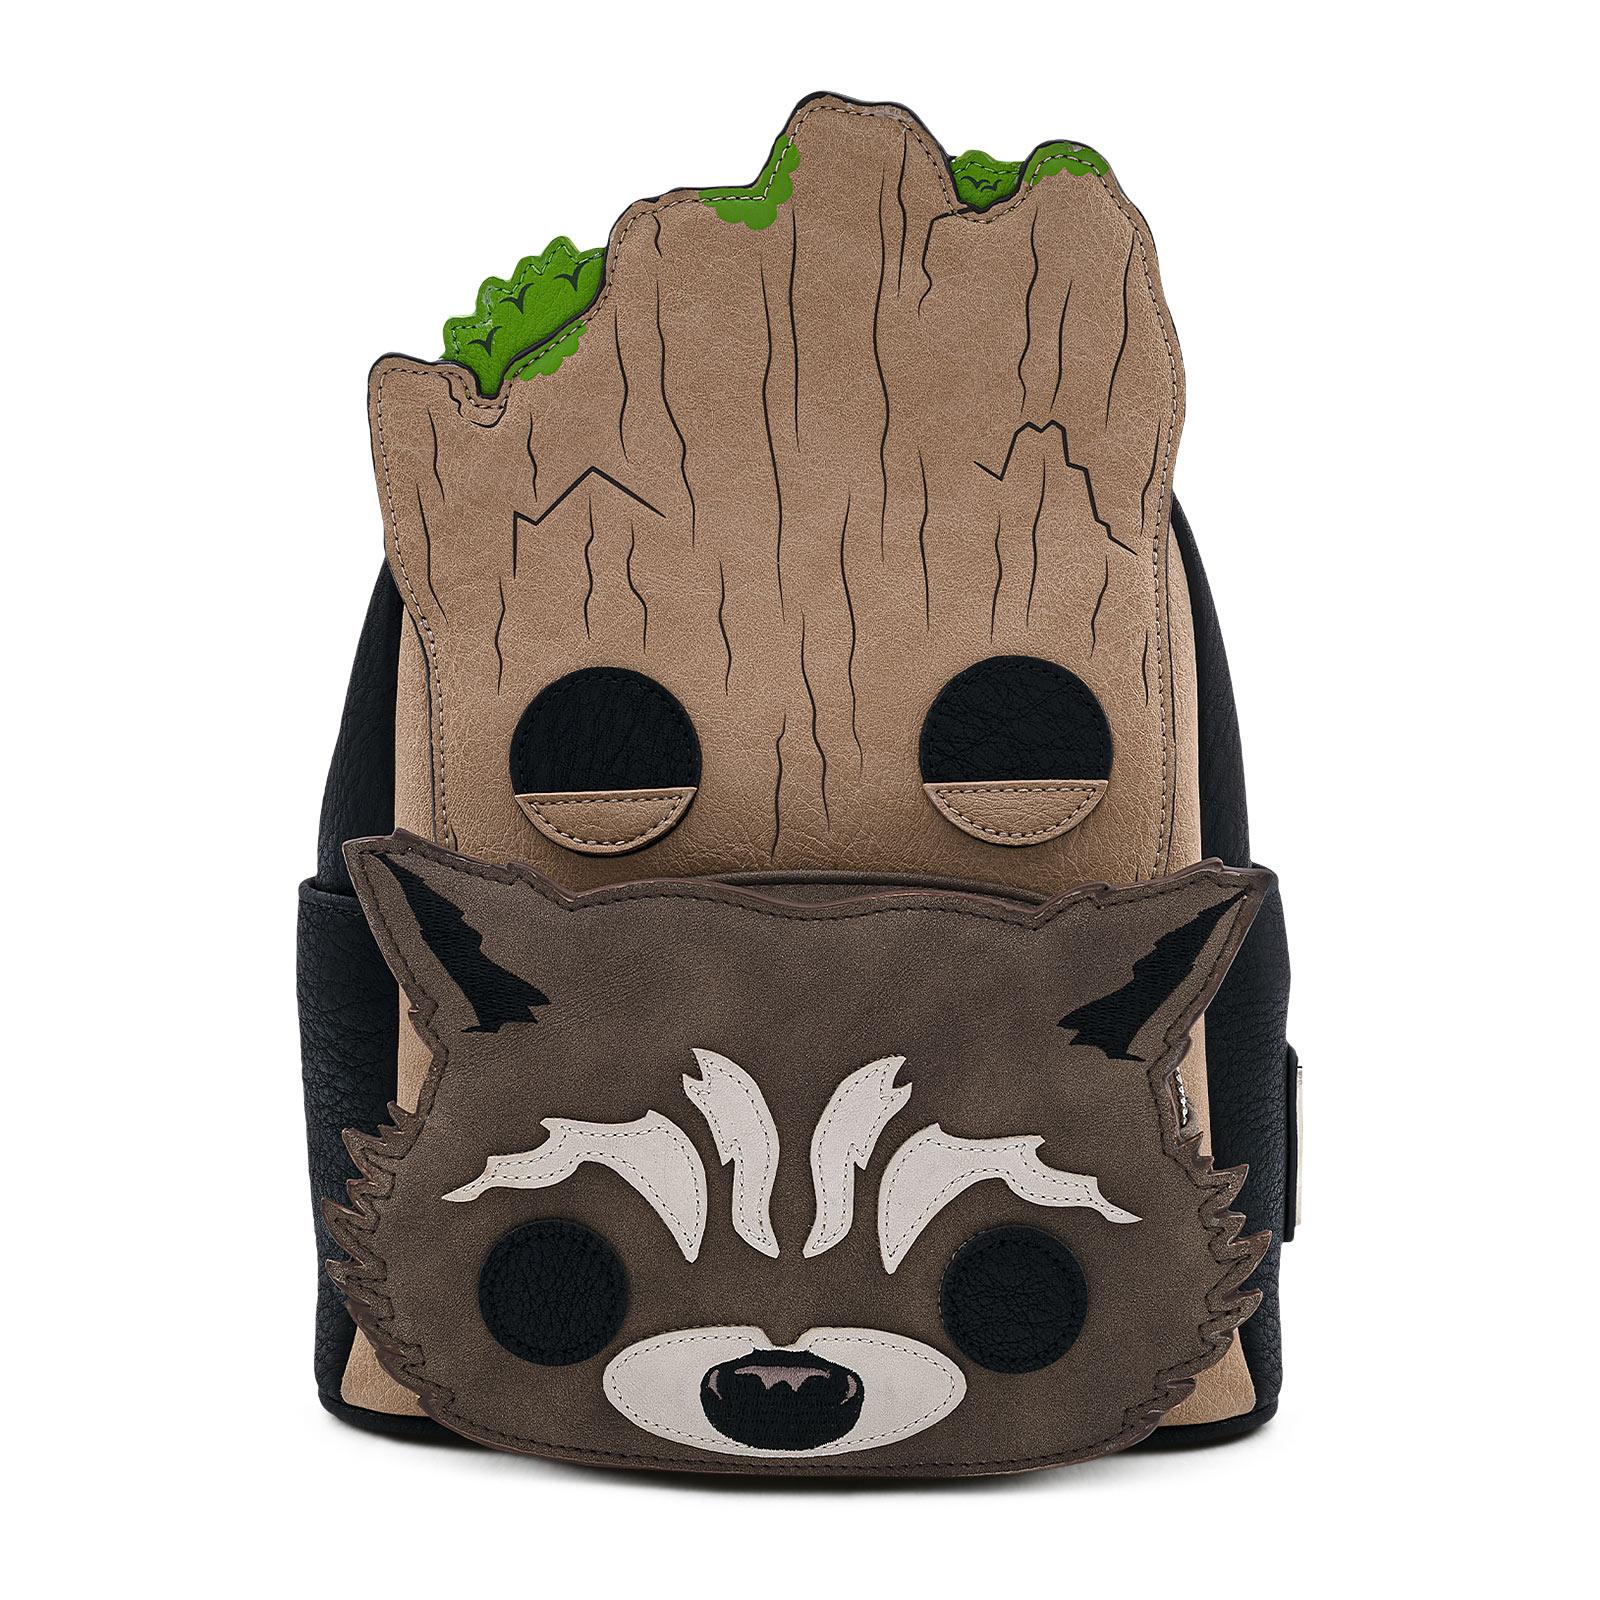 Guardians of the Galaxy - Groot und Rocket Mini Rucksack